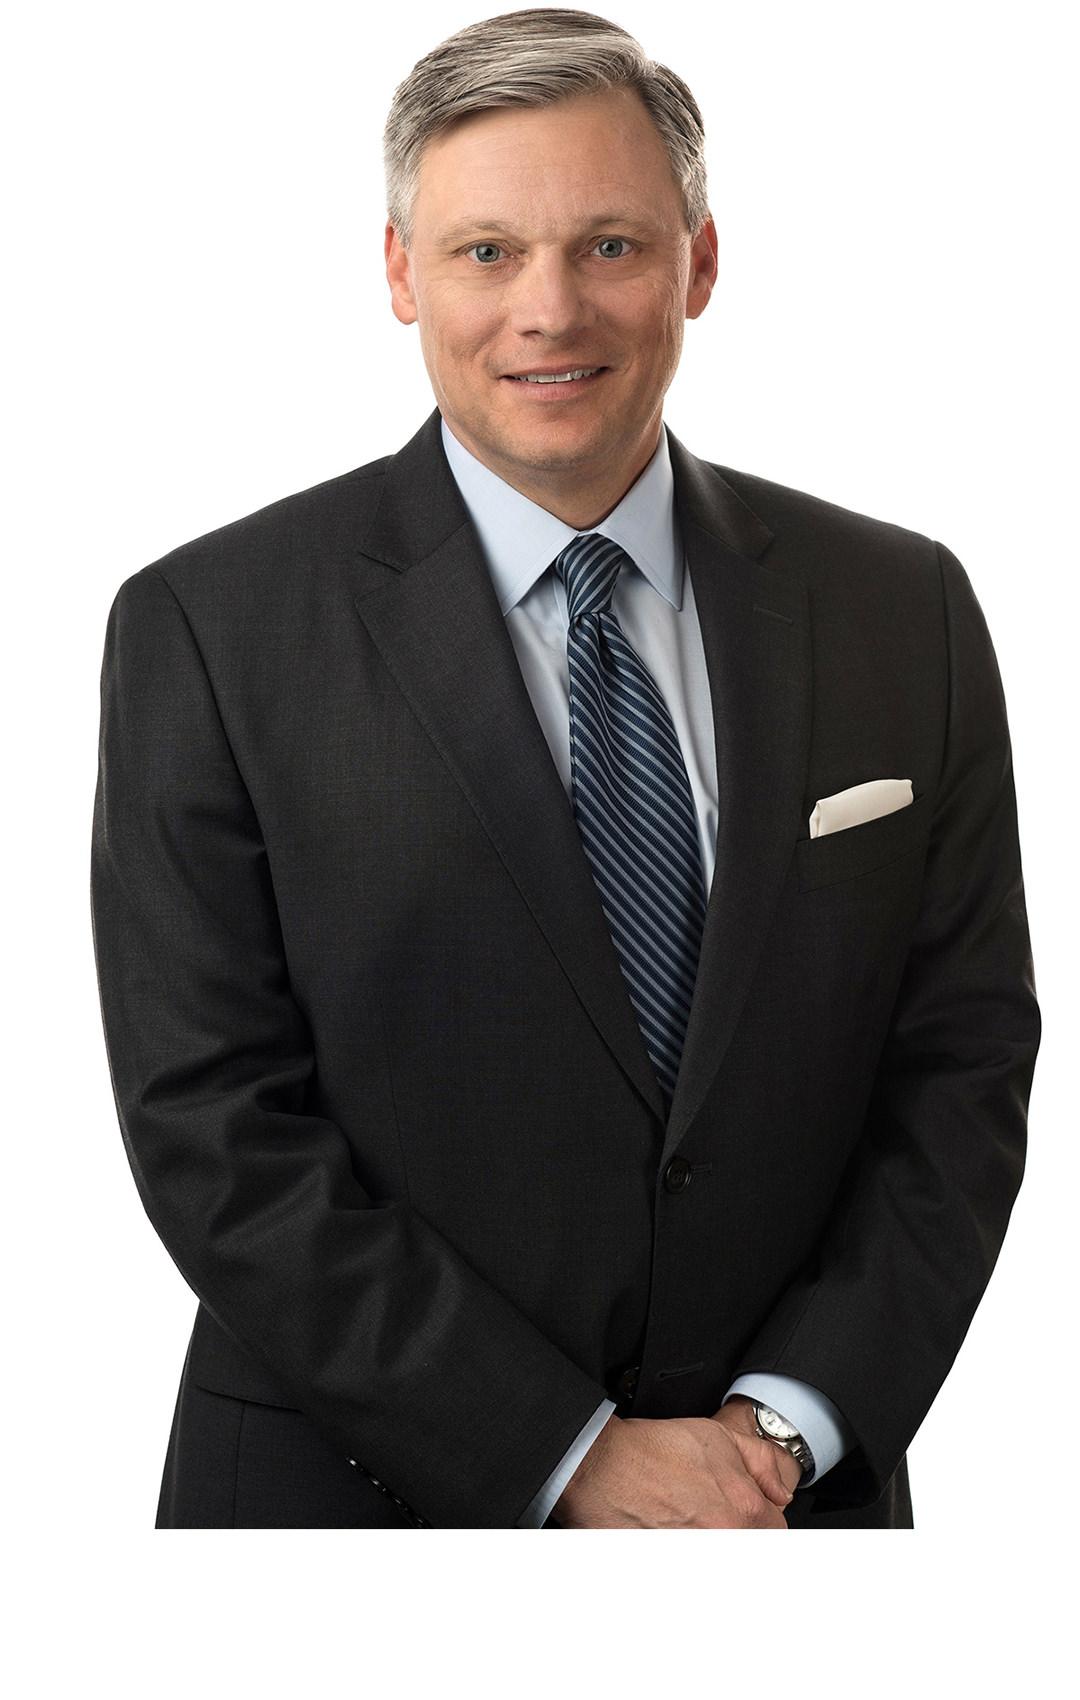 Timothy E. Madden